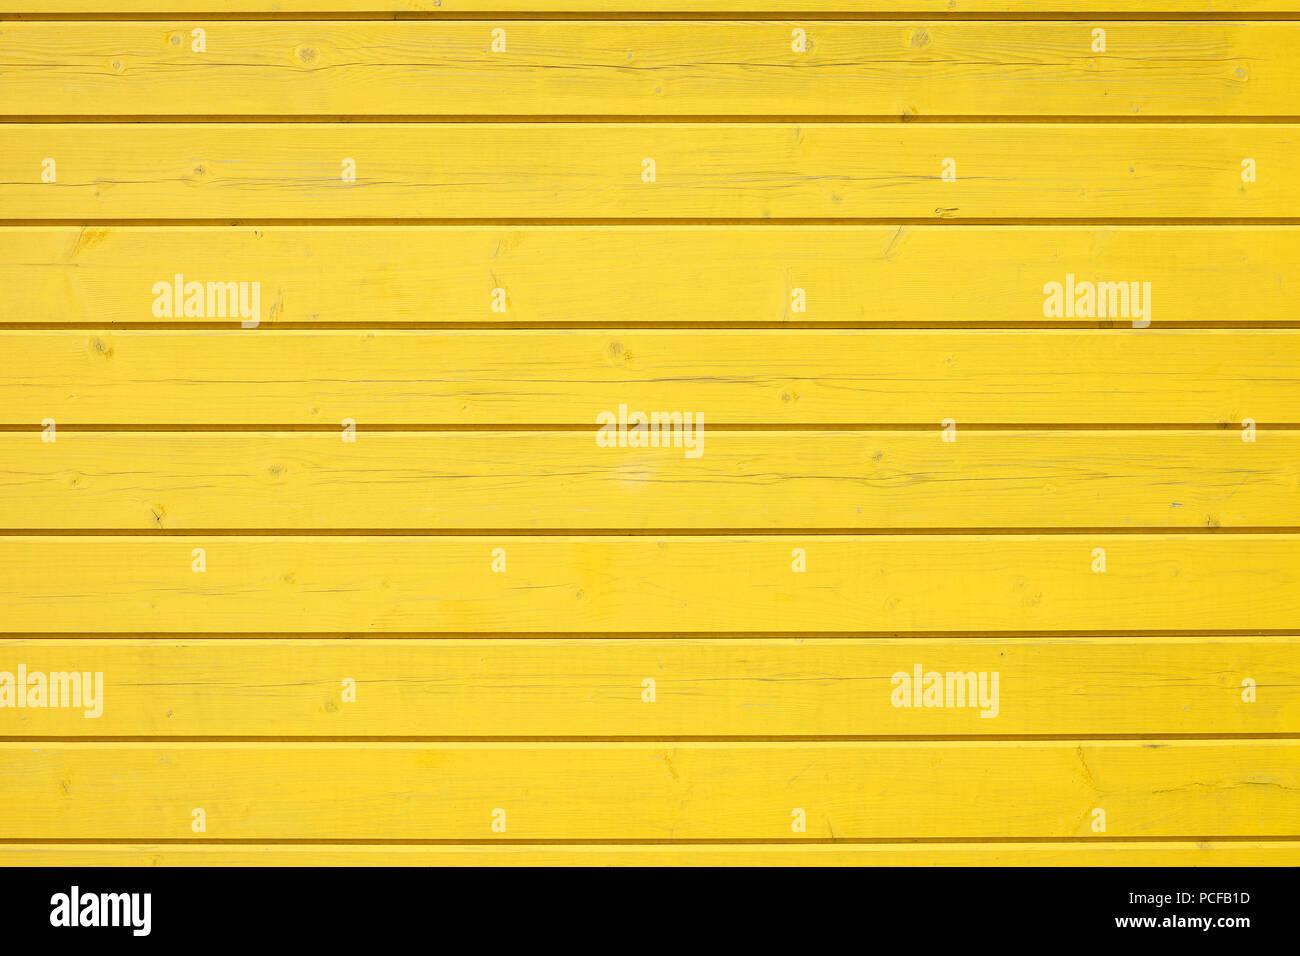 Holz- wand von horizontal angeordneten gelb lackierte Bretter, Hintergrundbild Stockbild